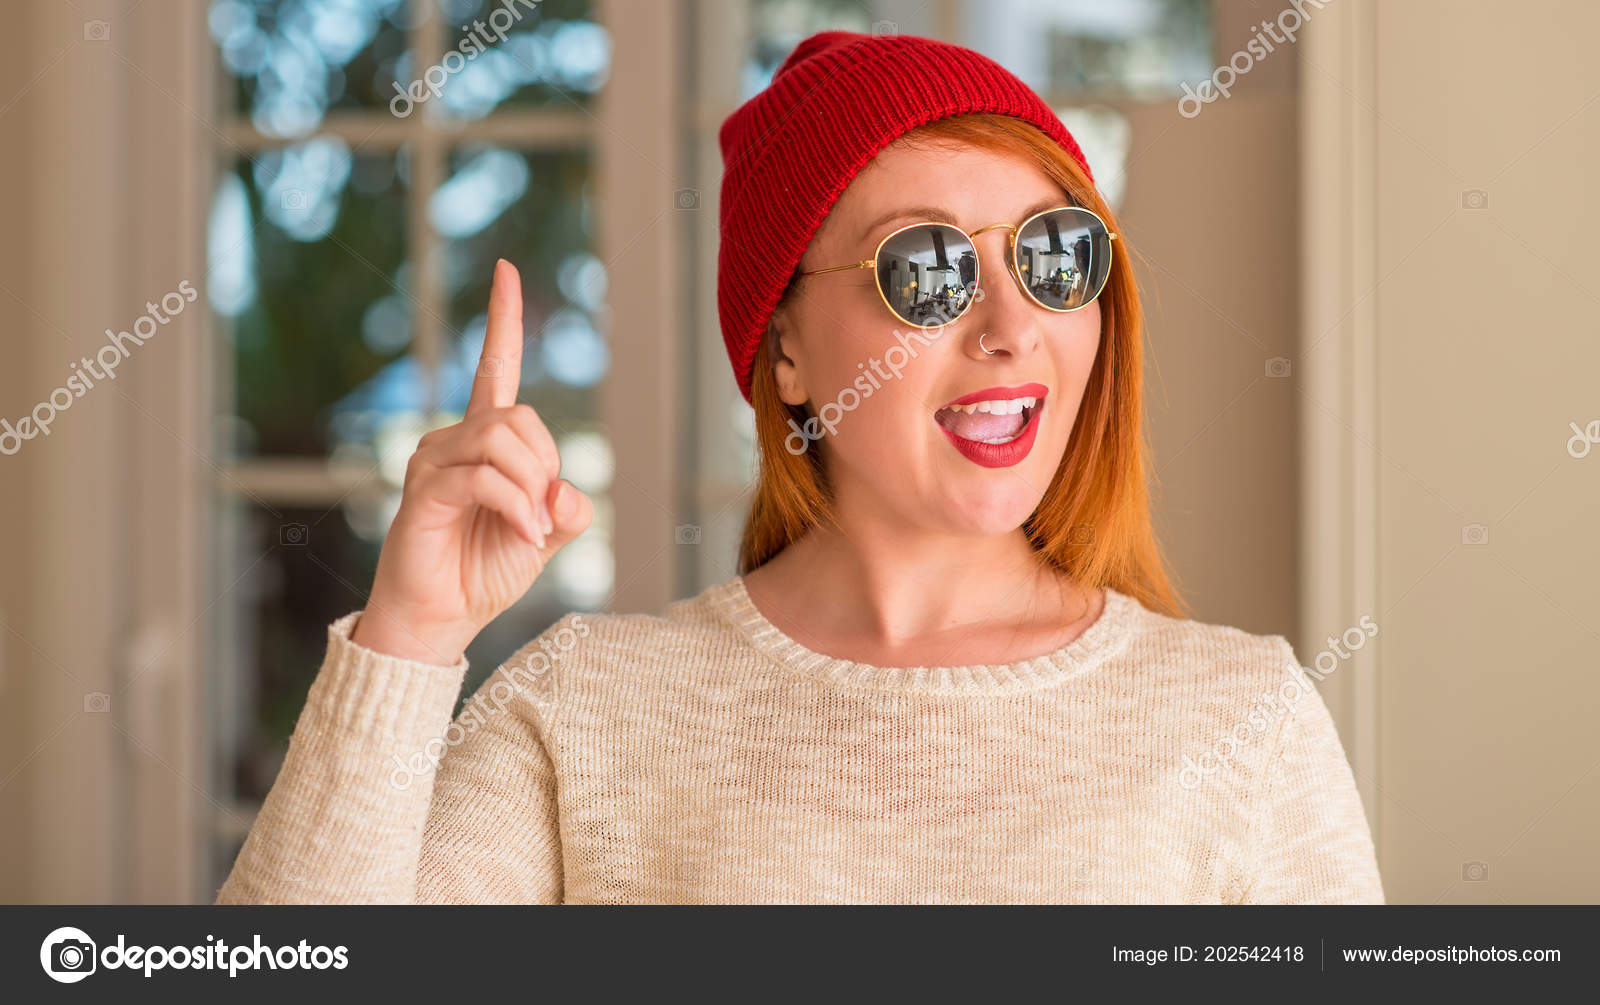 Elegante Gorro Sorprende Lana Pelirroja Mujer Gafas Con Sol 6gf7Yby